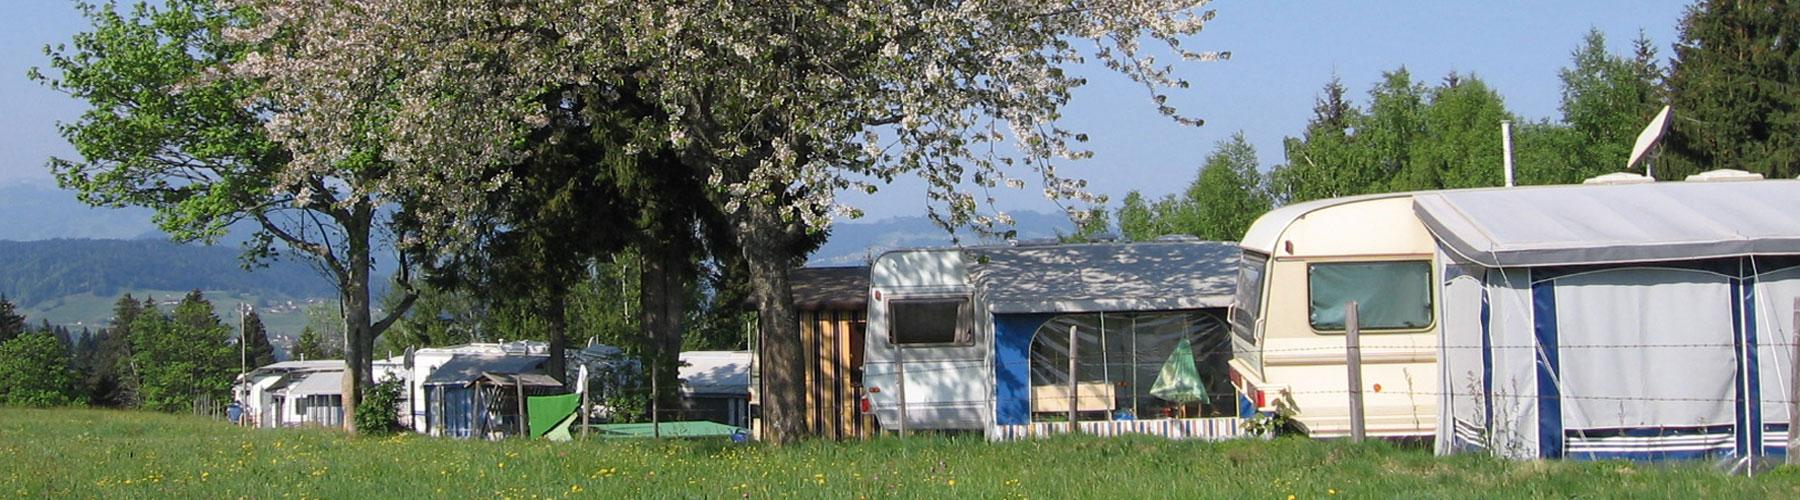 Campingplatz in der Natur